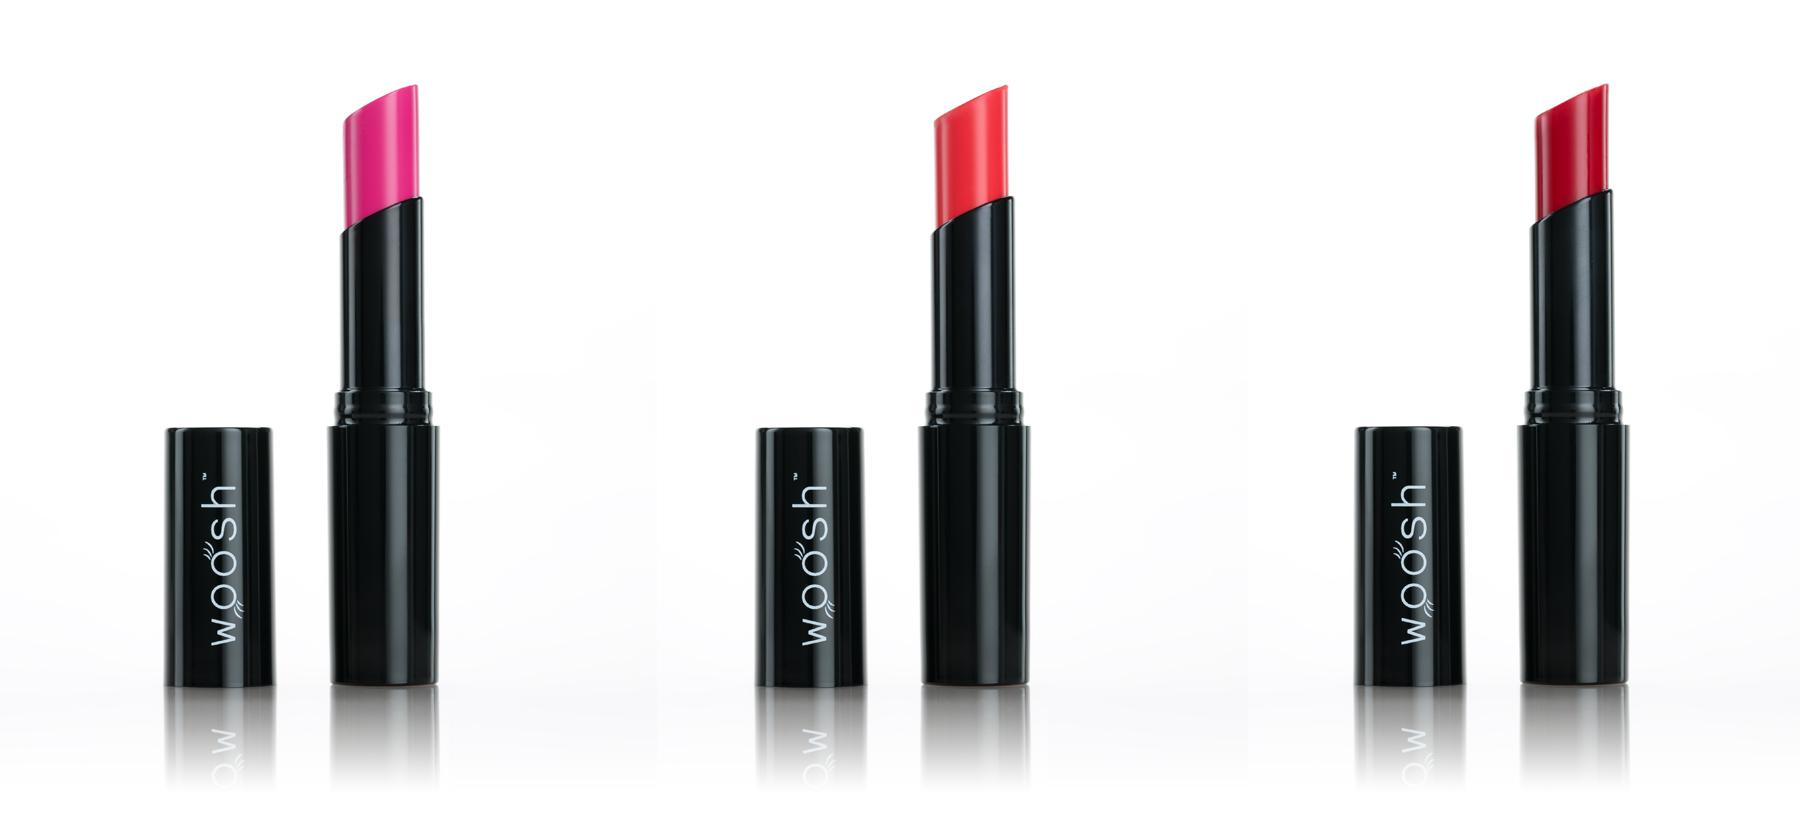 Woosh Beauty Lip Brights